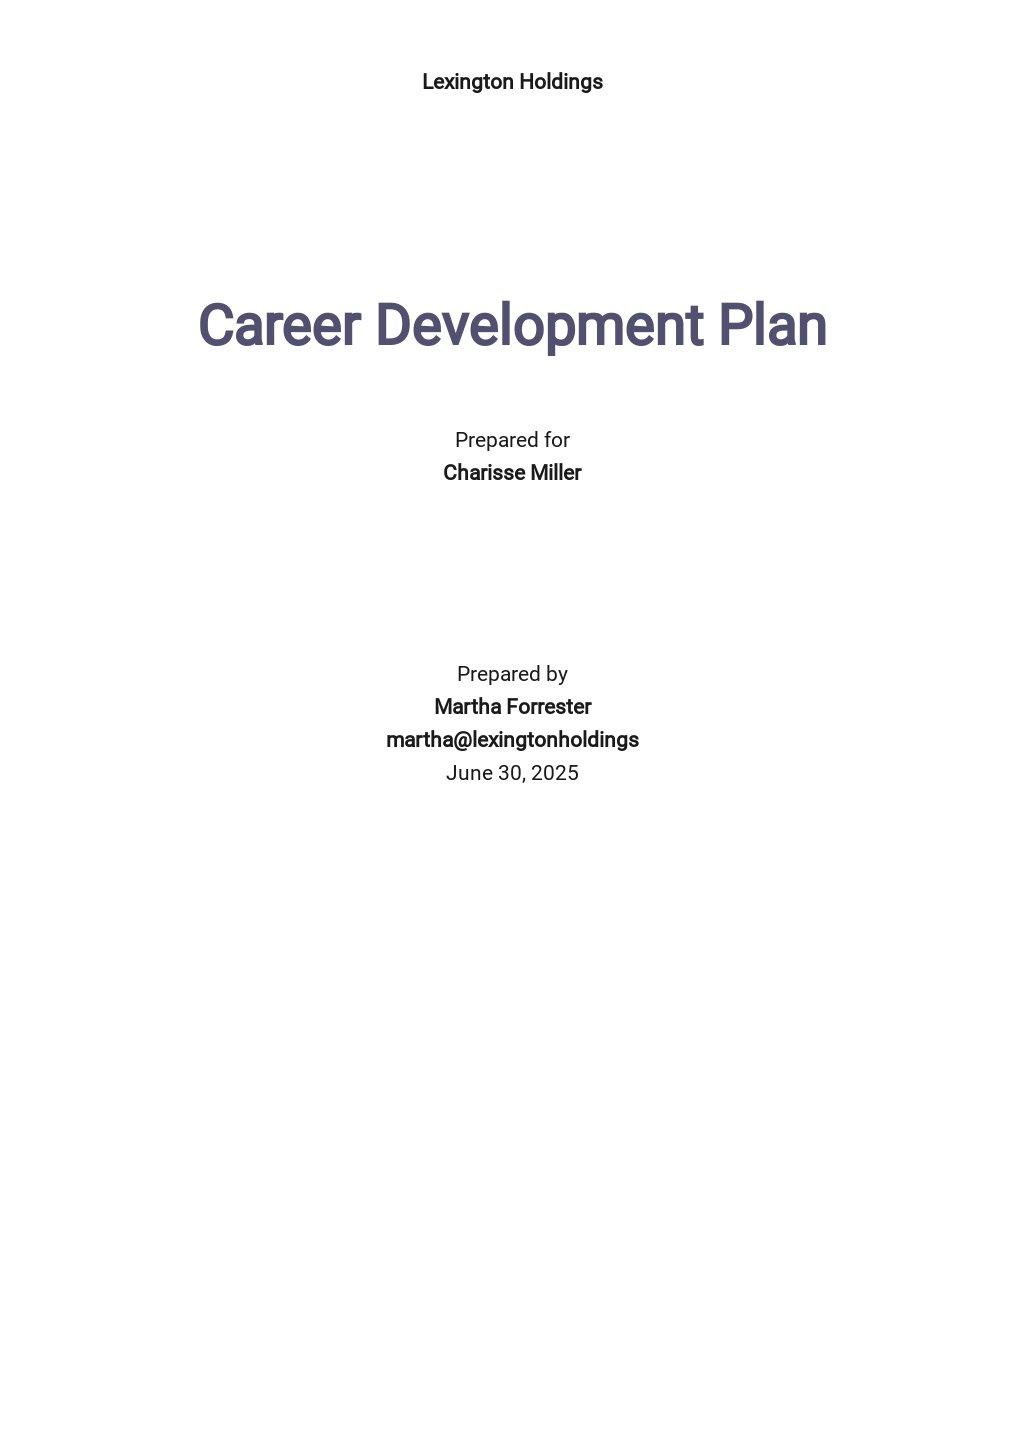 Human Resources Development Plan Template